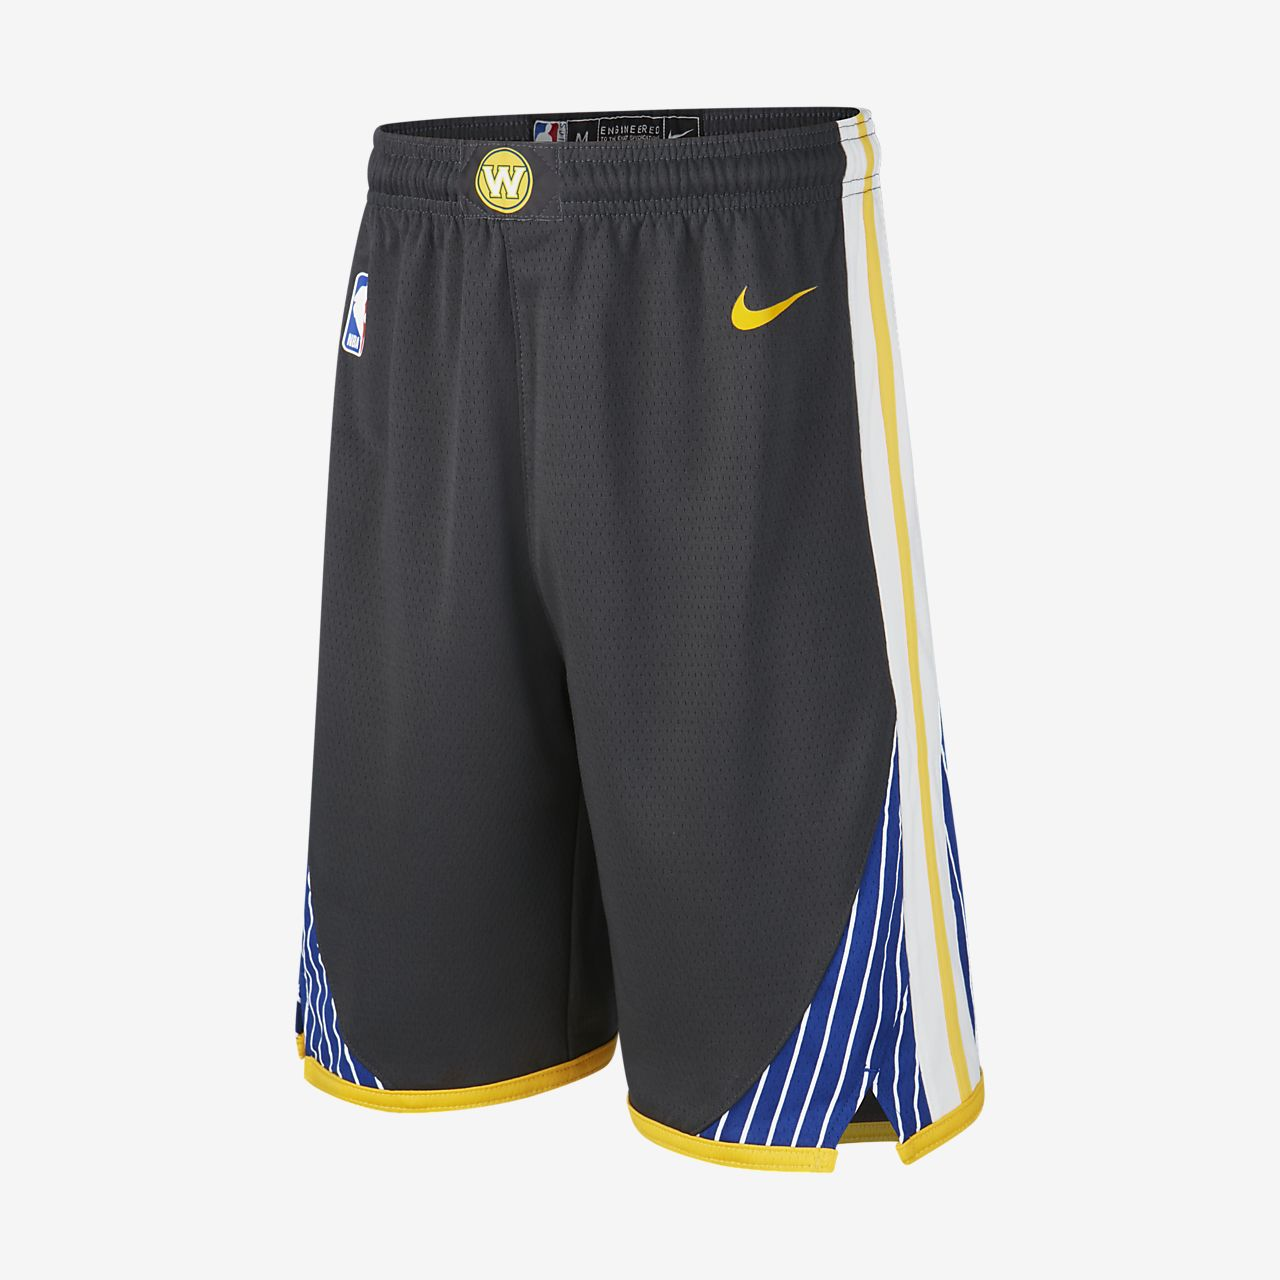 Golden State Warriors Statement Edition Swingman Pantalón corto de la NBA Nike - Niño/a